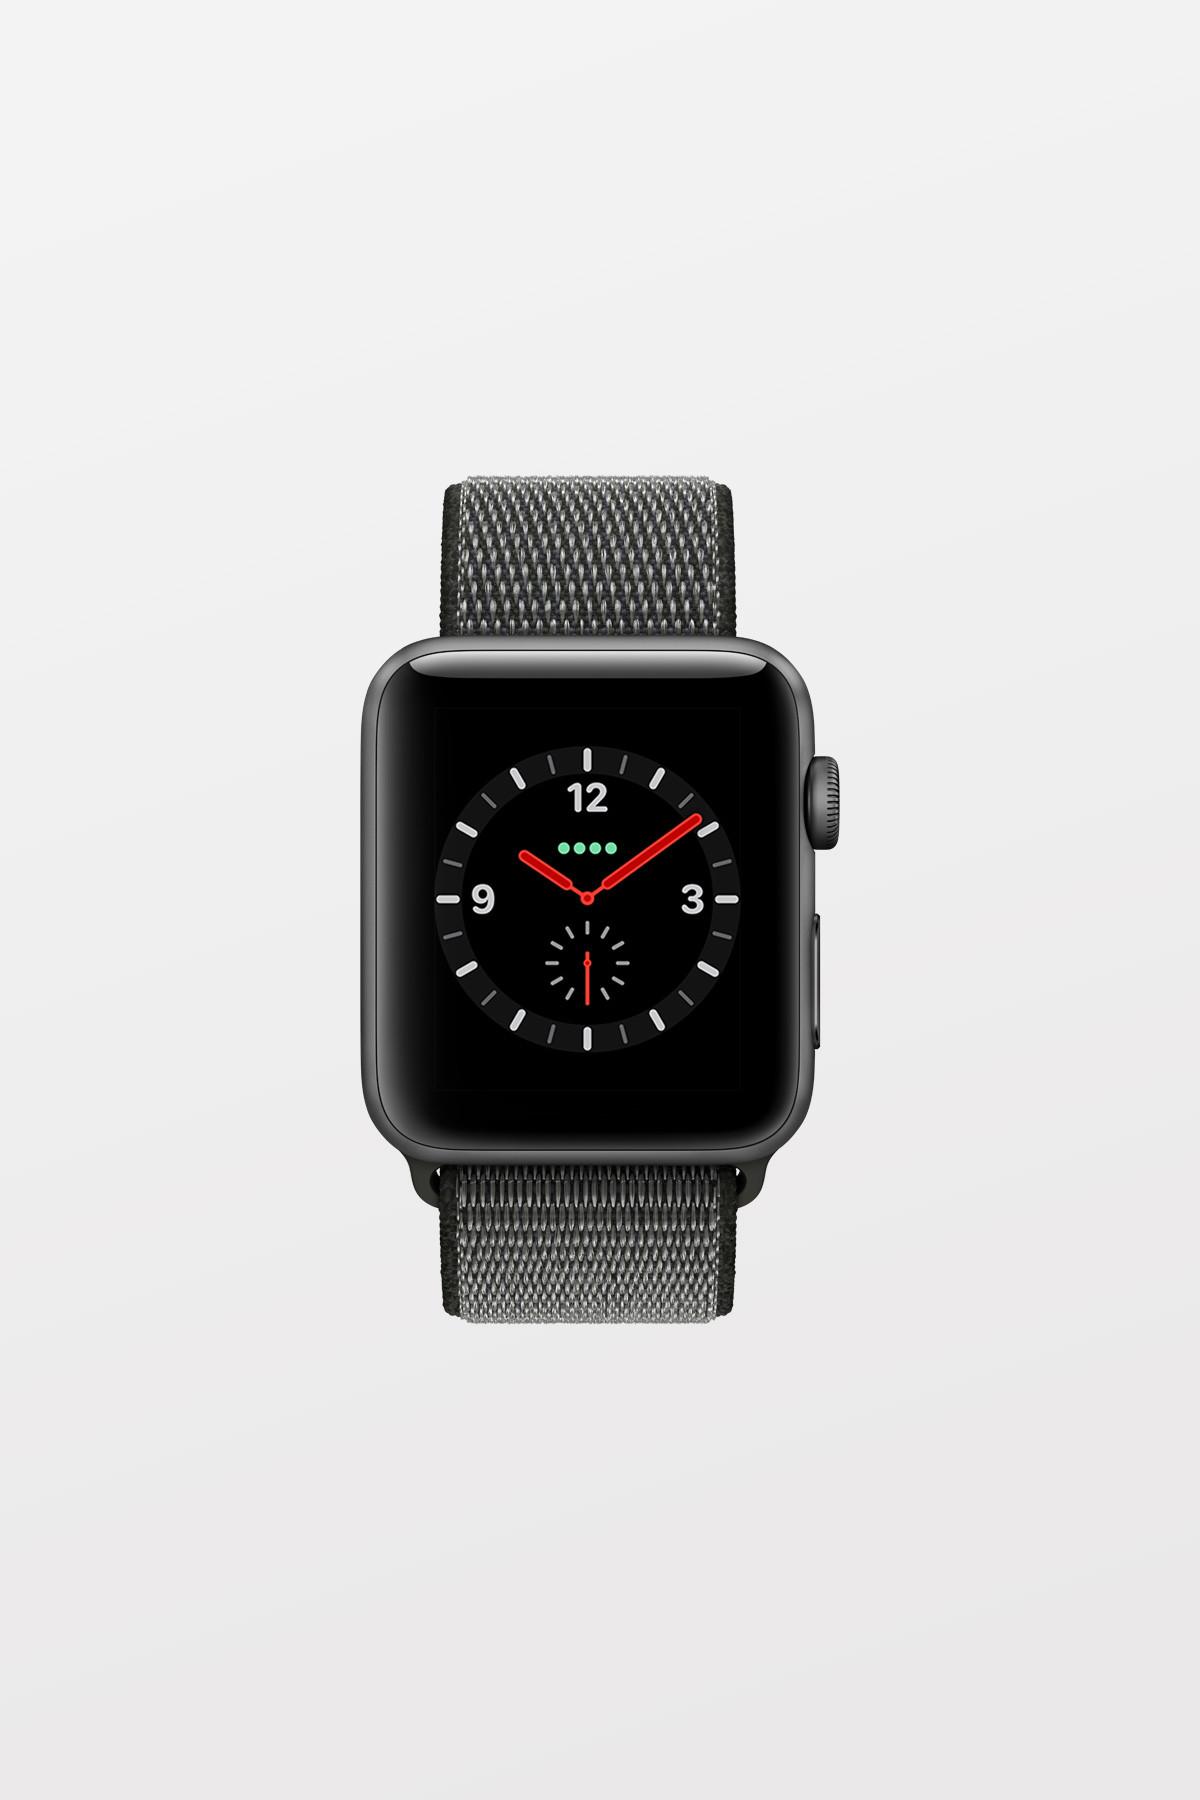 Apple Watch Series 3 Cellular - 42mm - Space Grey Aluminium Case with Black Sport Loop